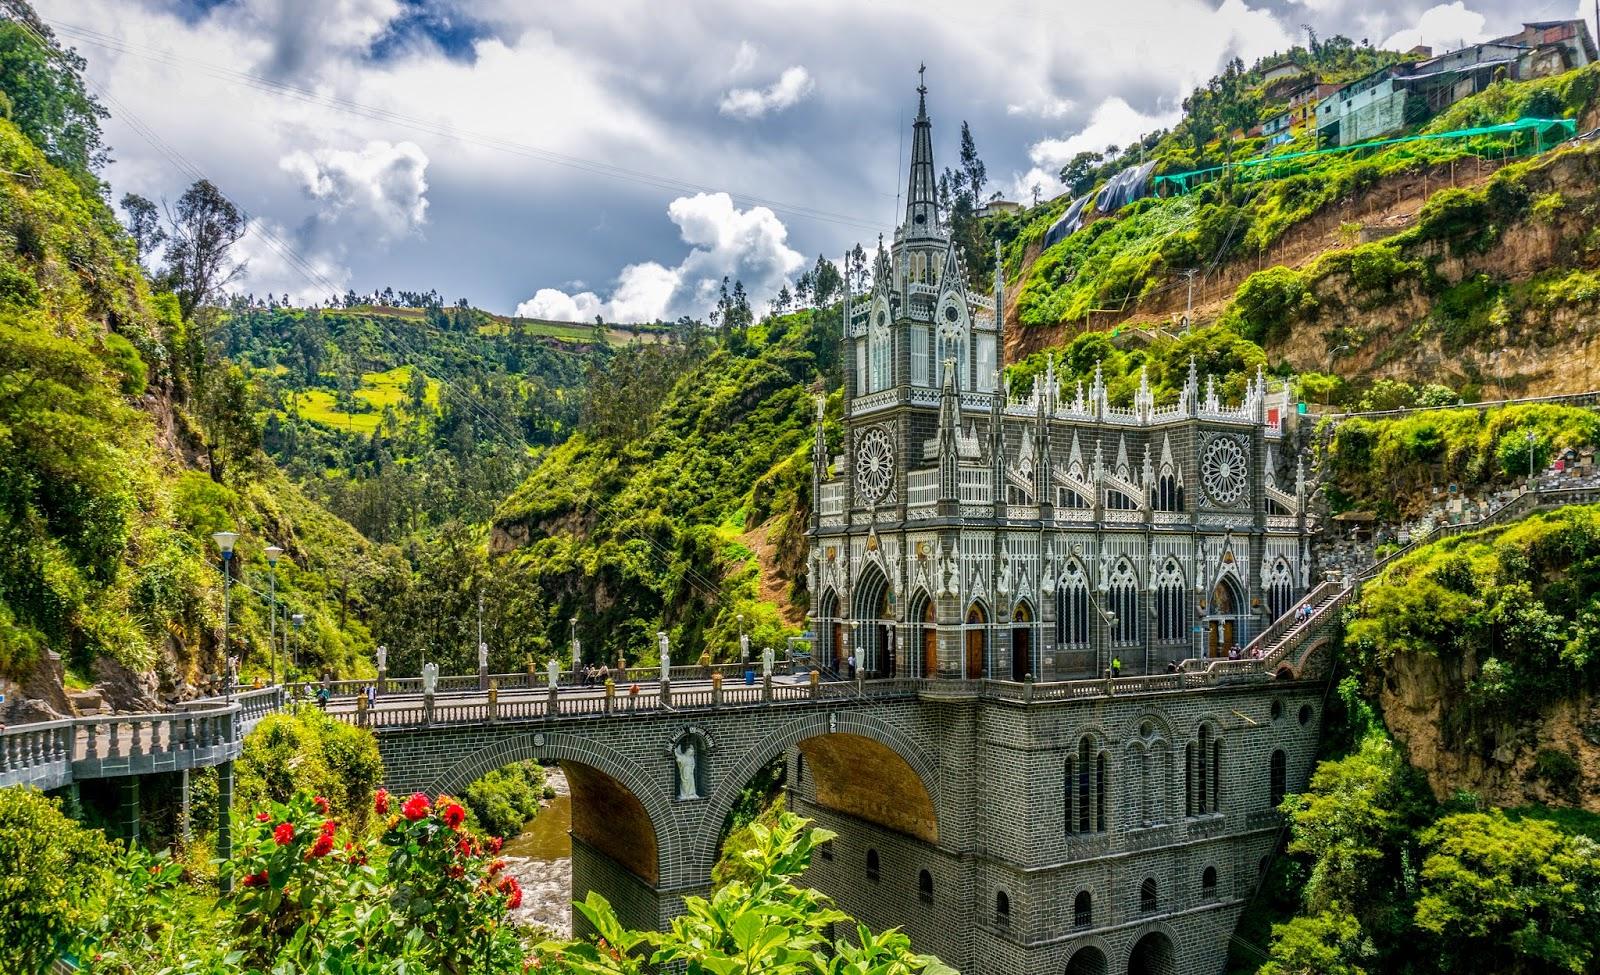 Amado Santuário de Las Lajas na Colômbia | Dicas das Américas CL57